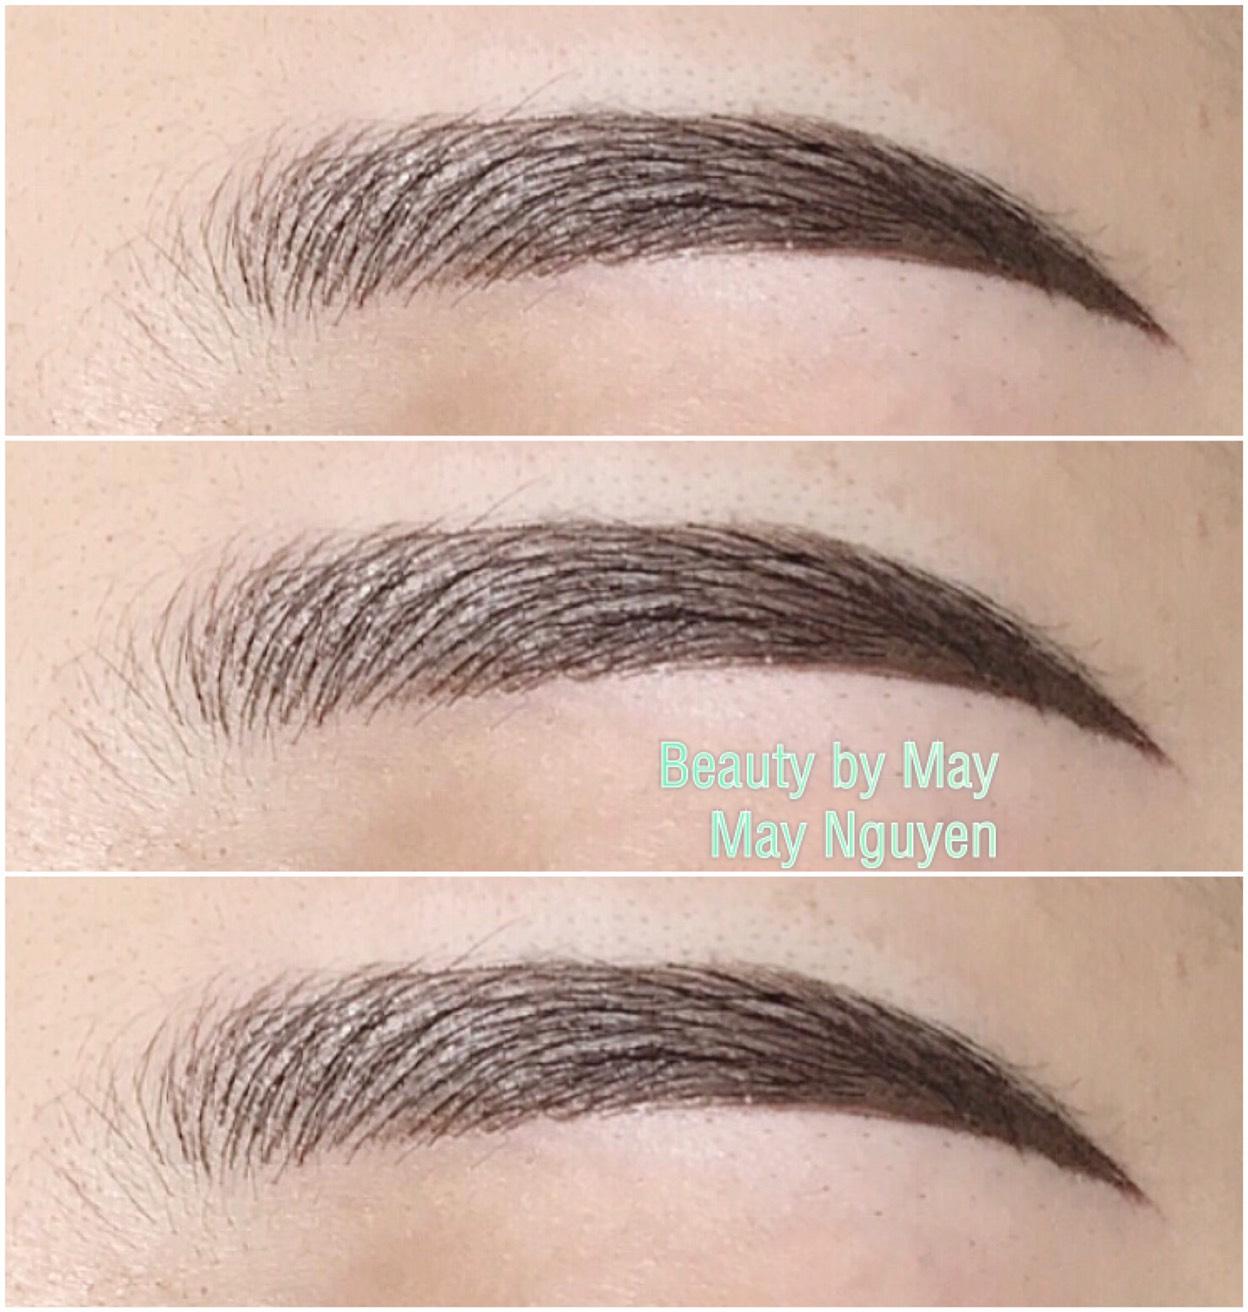 ca231badb88 beautybymay.com - Brow Microblading - Makeup Artist, Eyelash ...